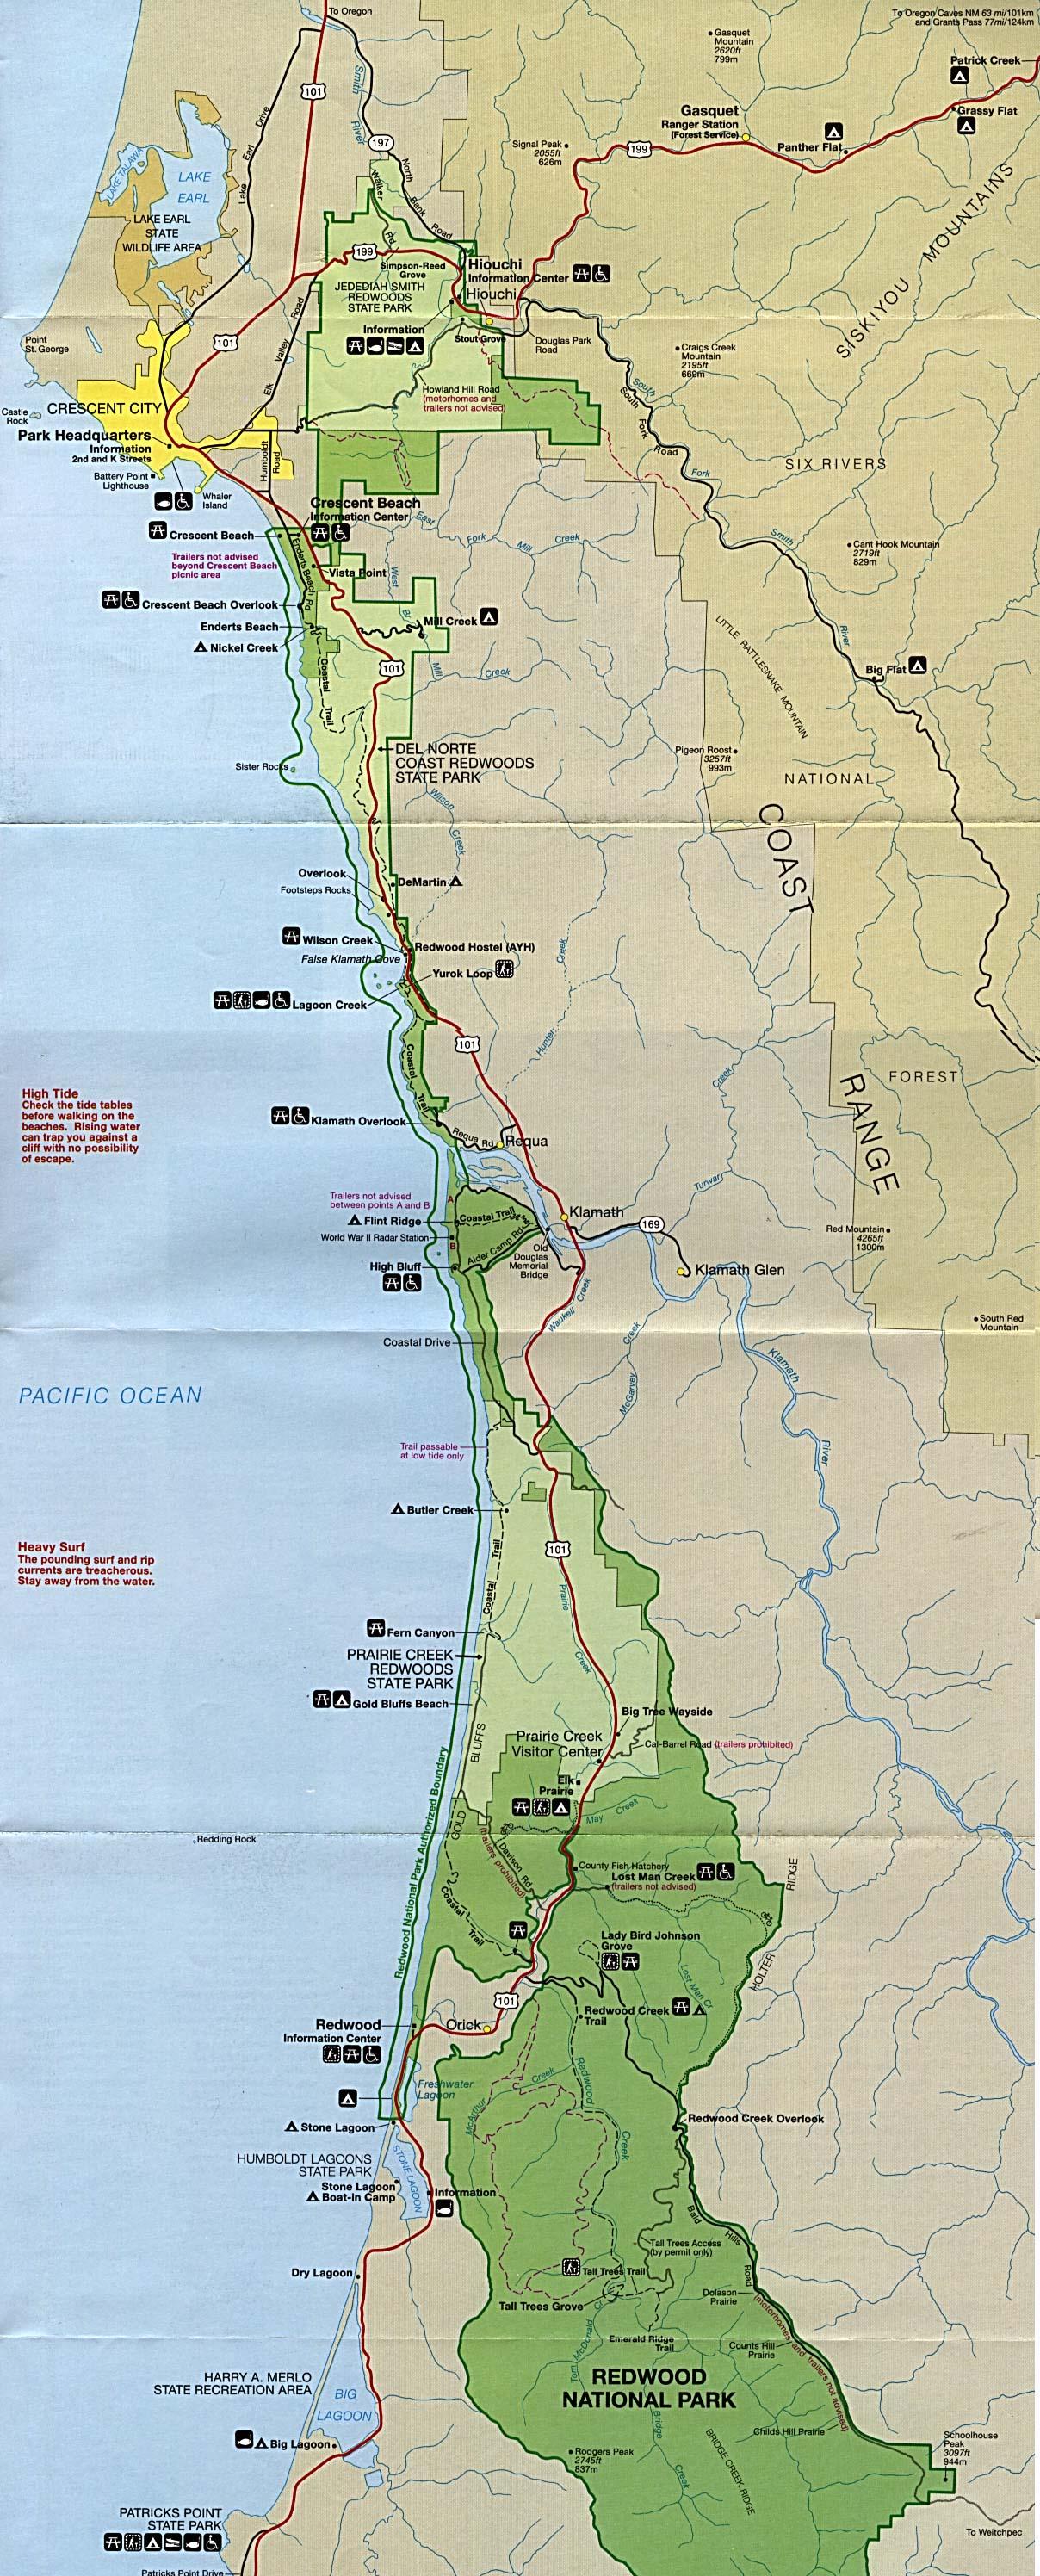 Redwood National Park Map, California, United States